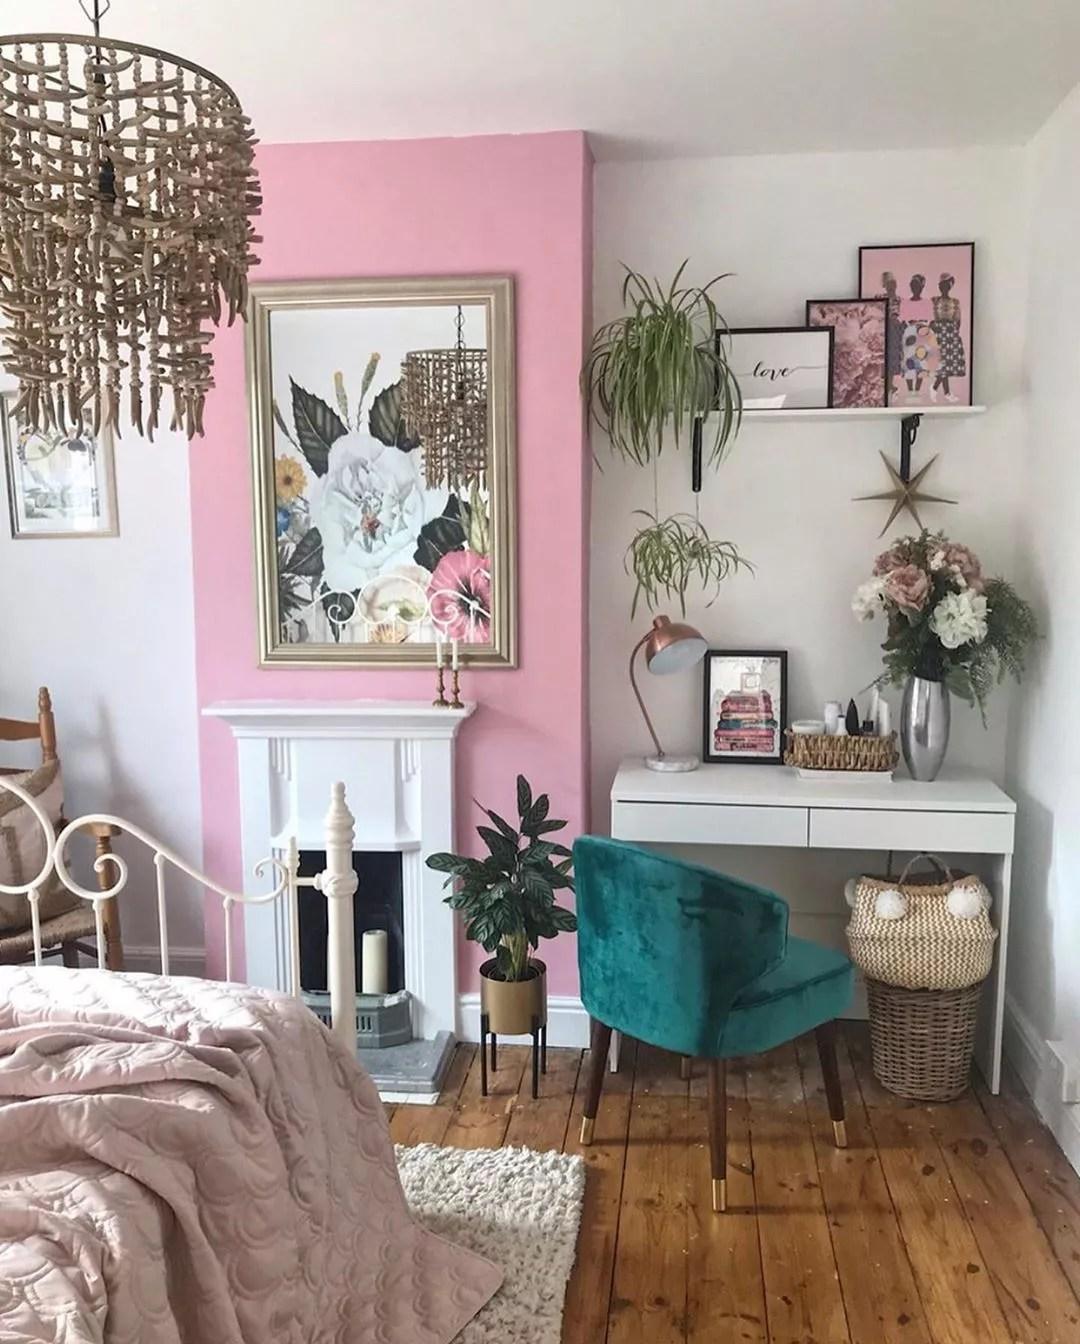 Studio apartment bedroom with cute desk. Photo by Instagram user @desklifebliss